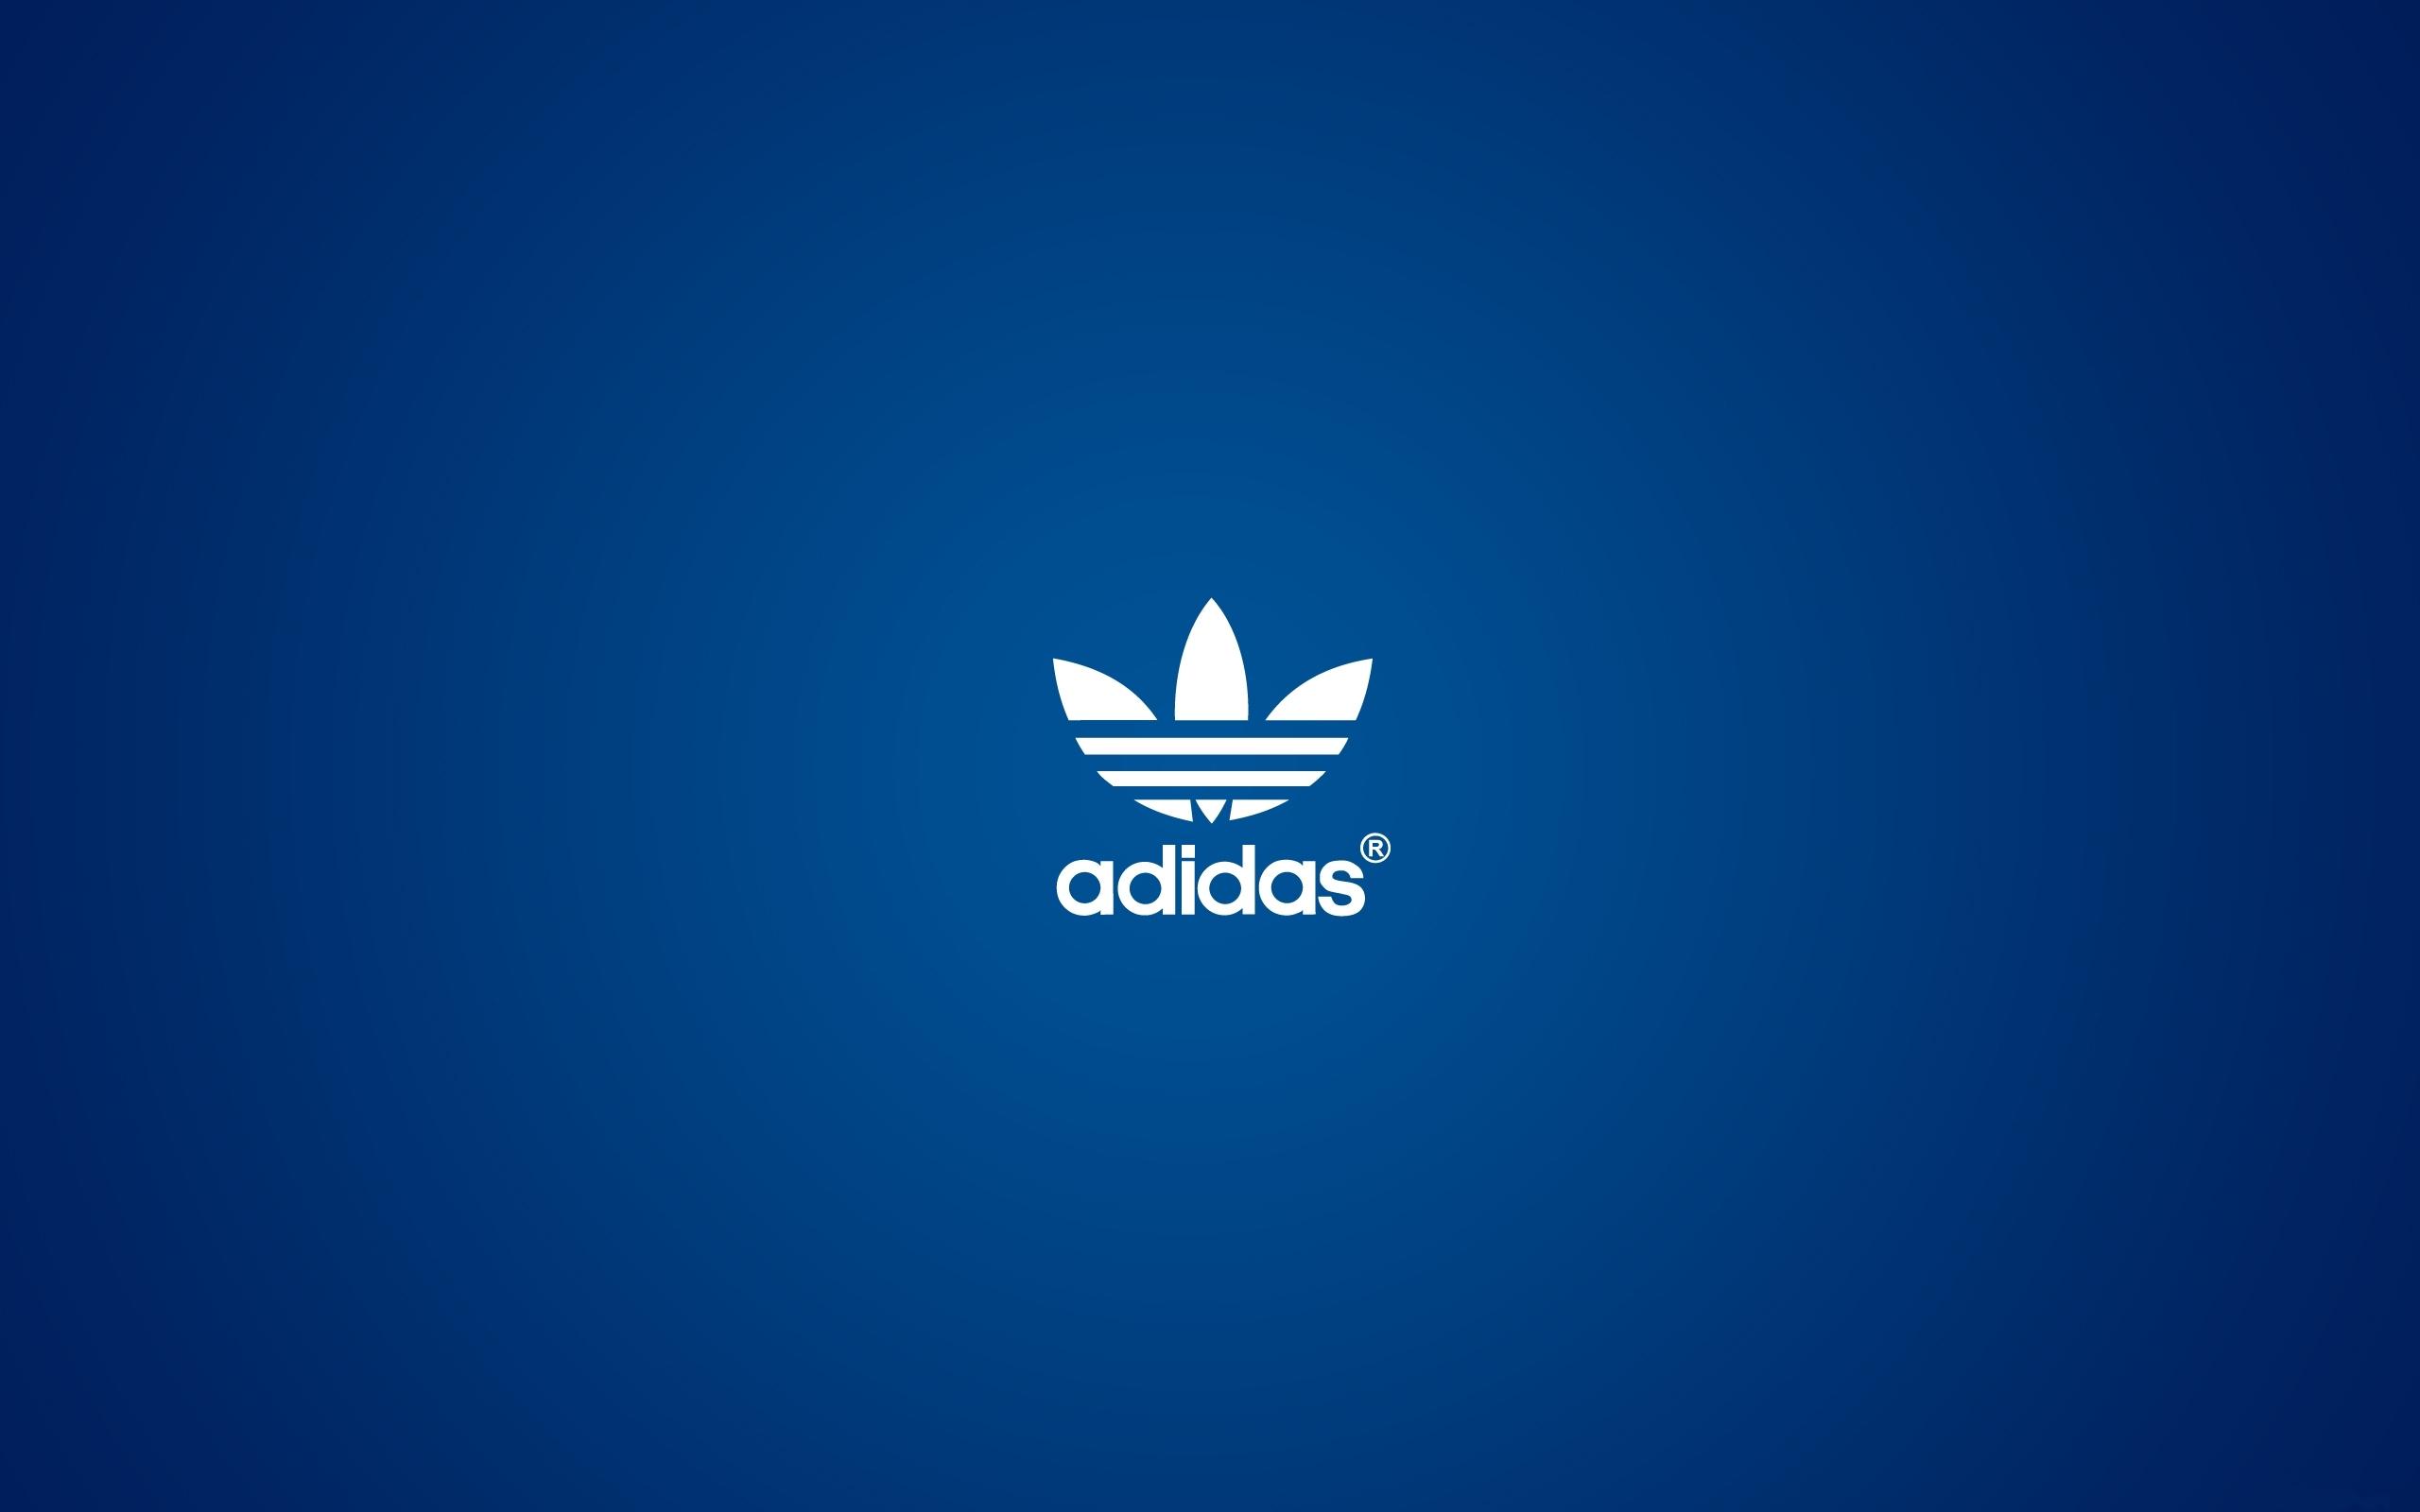 Sports adidas brand clothes wallpaper   ForWallpapercom 2560x1600